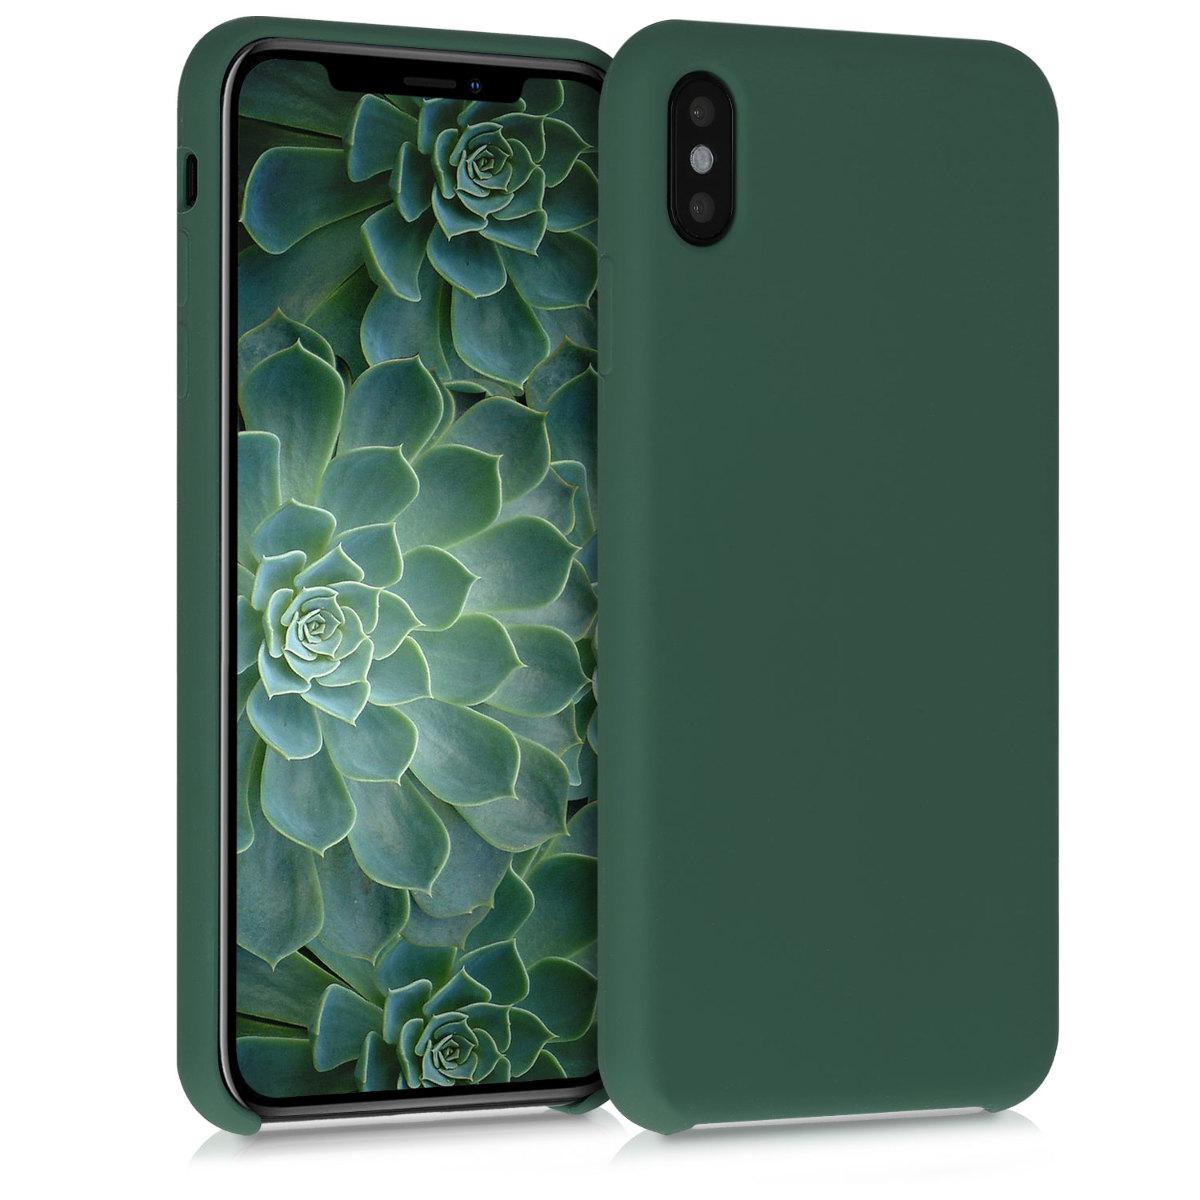 Kvalitní silikonové TPU pouzdro pro Apple iPhone XS Max - Moss Green